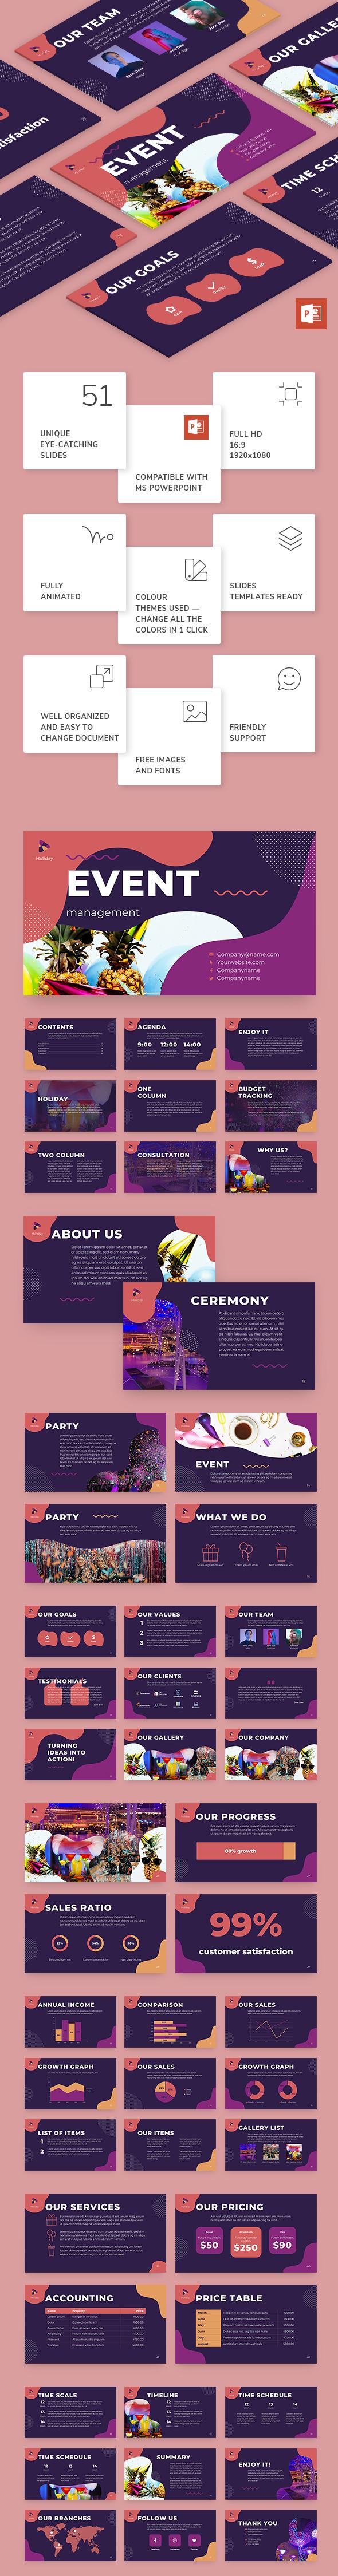 Event Management PowerPoint Presentation Template